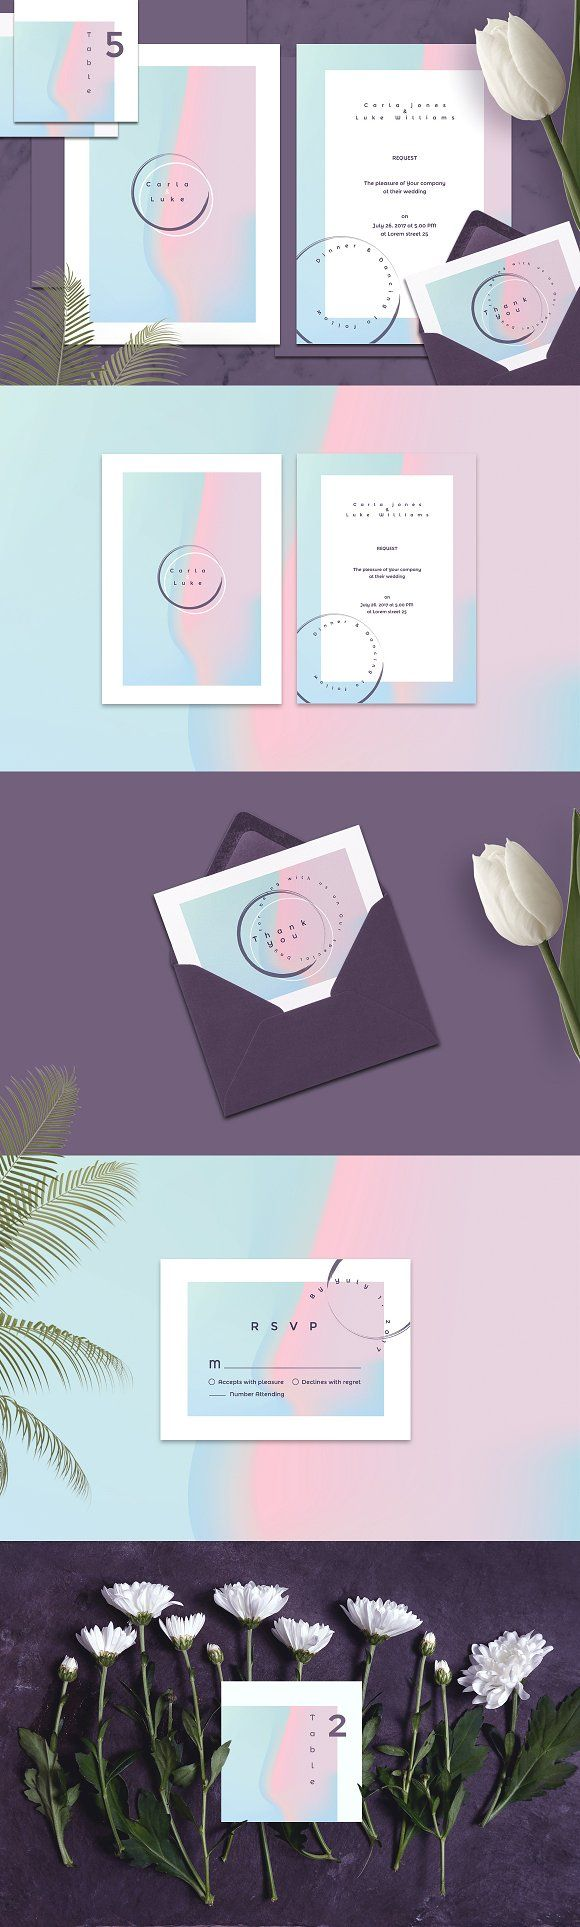 wedding invitations design template%0A Sample Resume Format Download